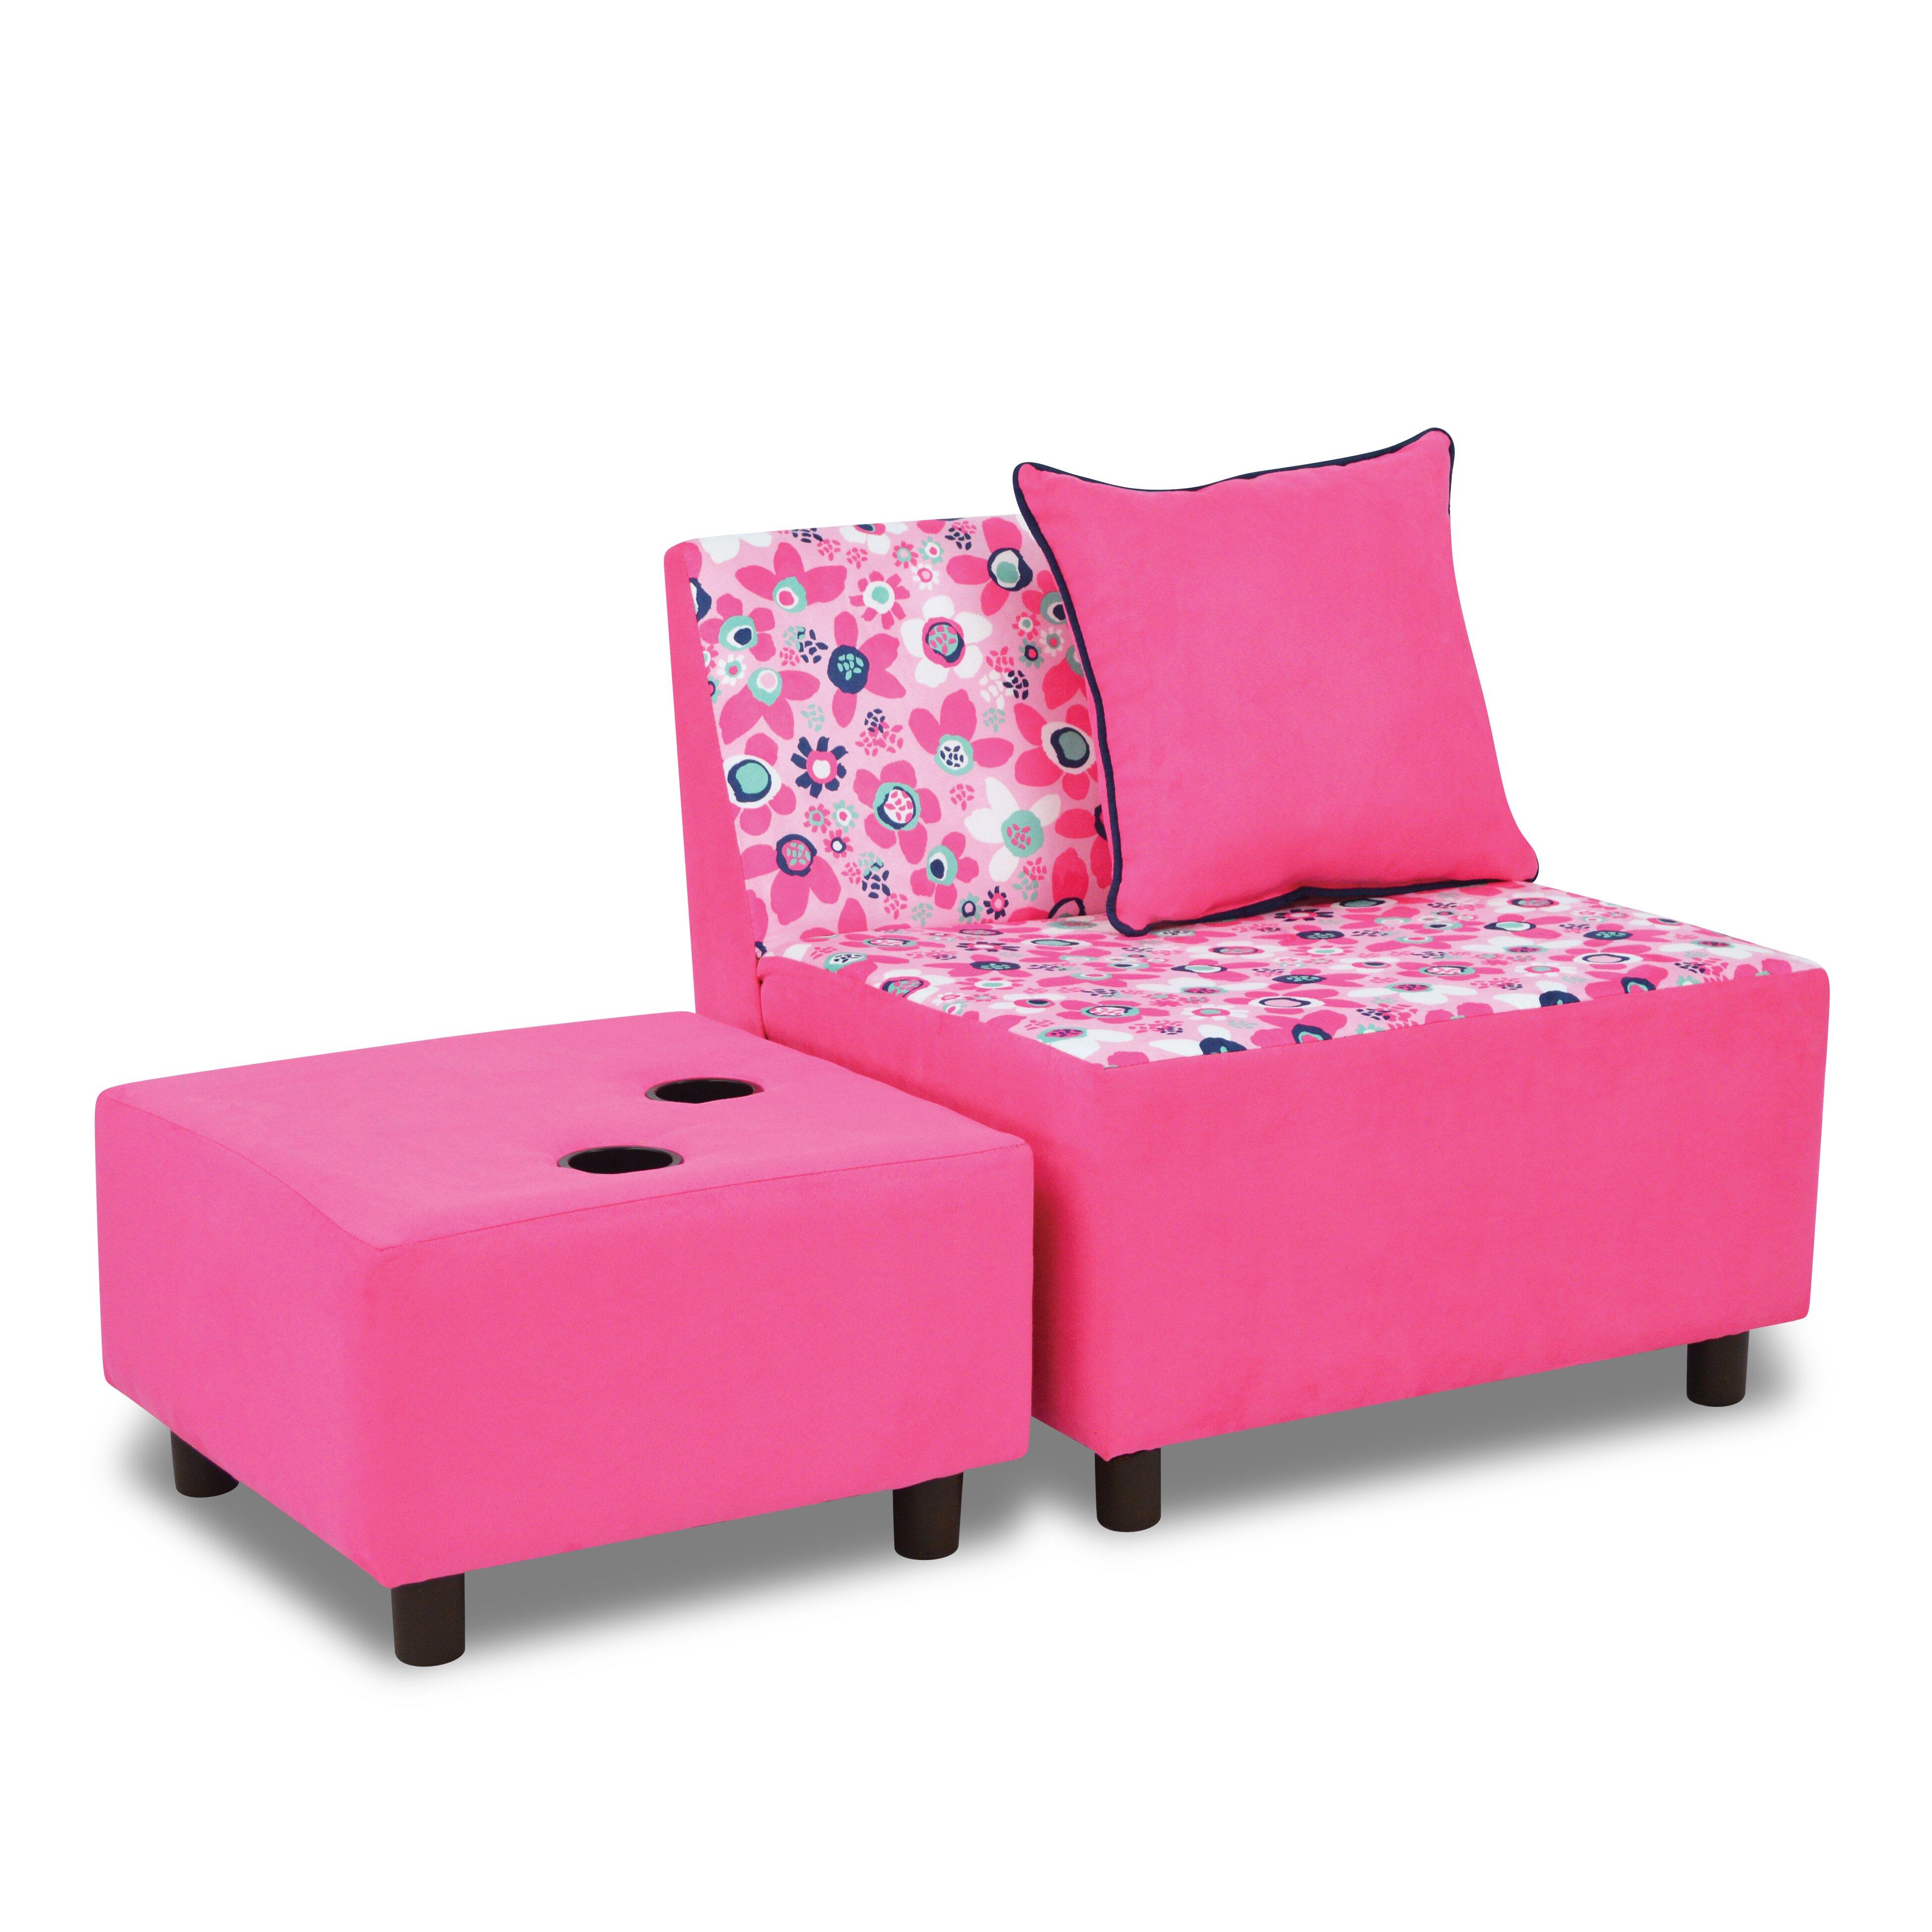 Kangaroo Trading Company Tween Kids Chair And Ottoman With